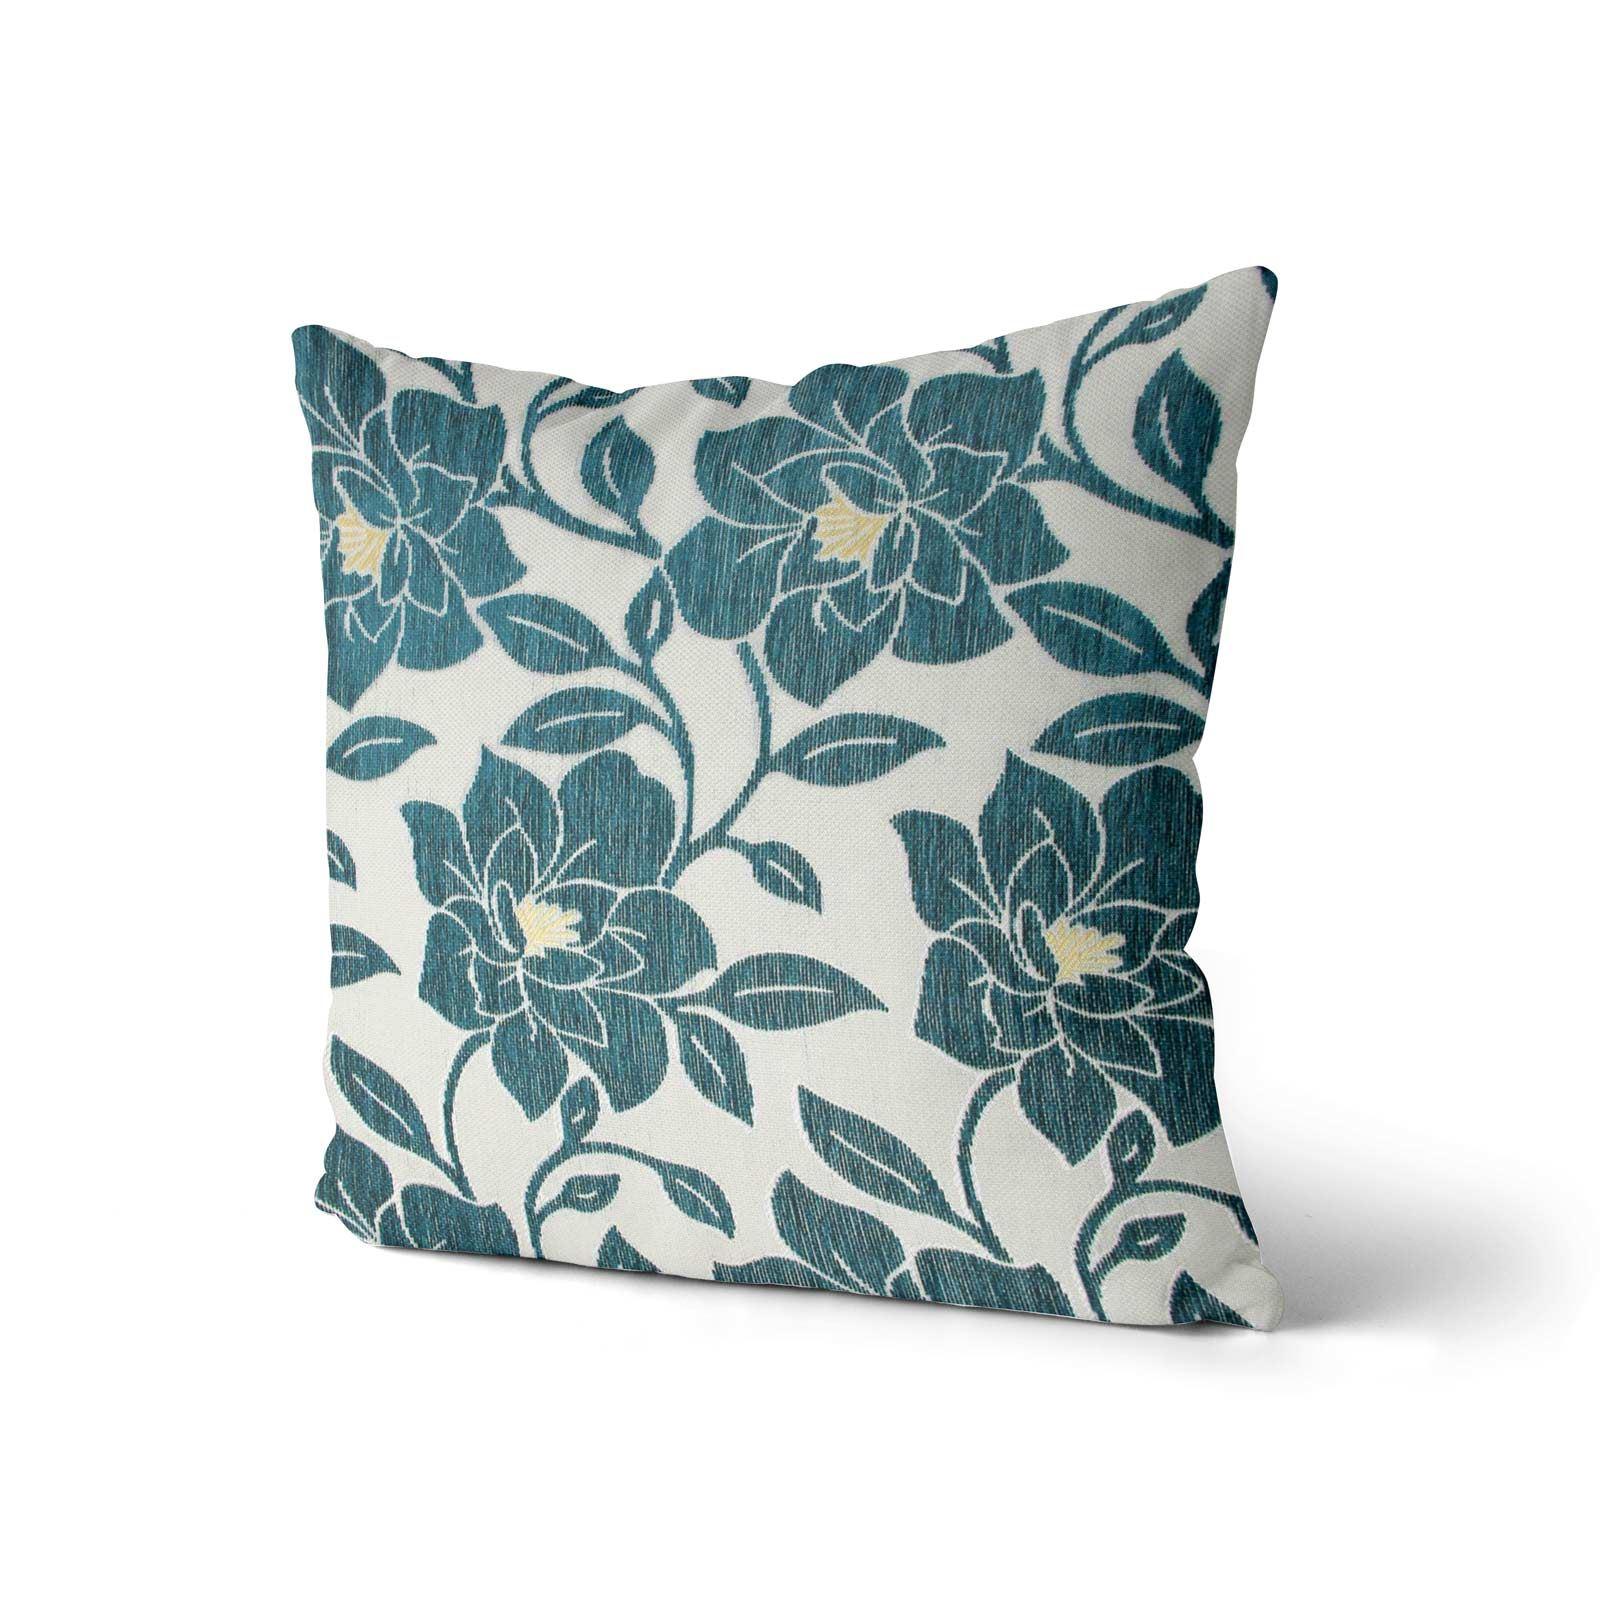 Teal-Blue-Duck-Egg-Cushion-Covers-18-034-x18-034-45cm-x-45cm-Luxury-Cover thumbnail 42